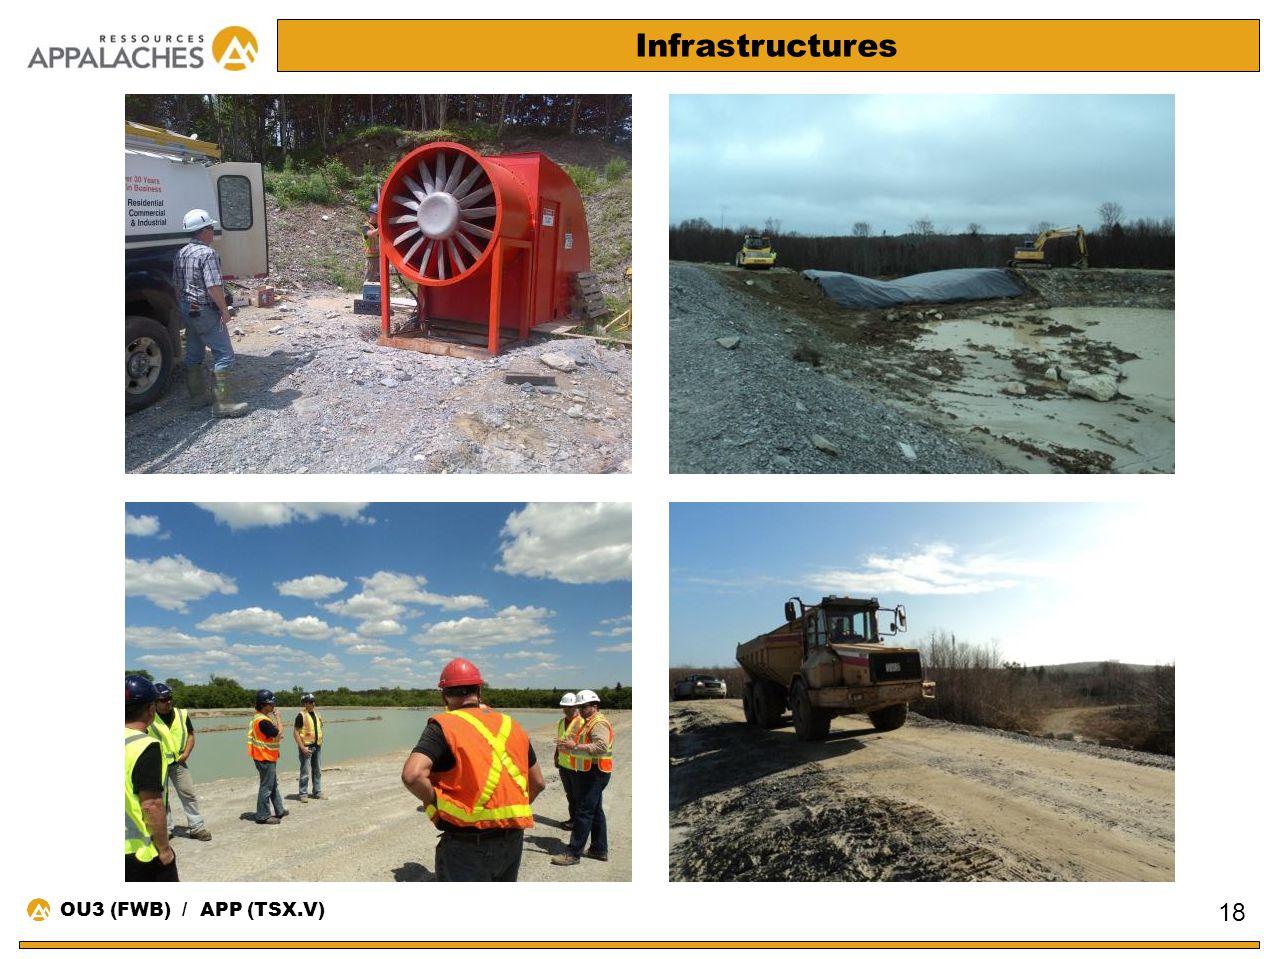 Infrastructures OU3 (FWB) / APP (TSX.V)